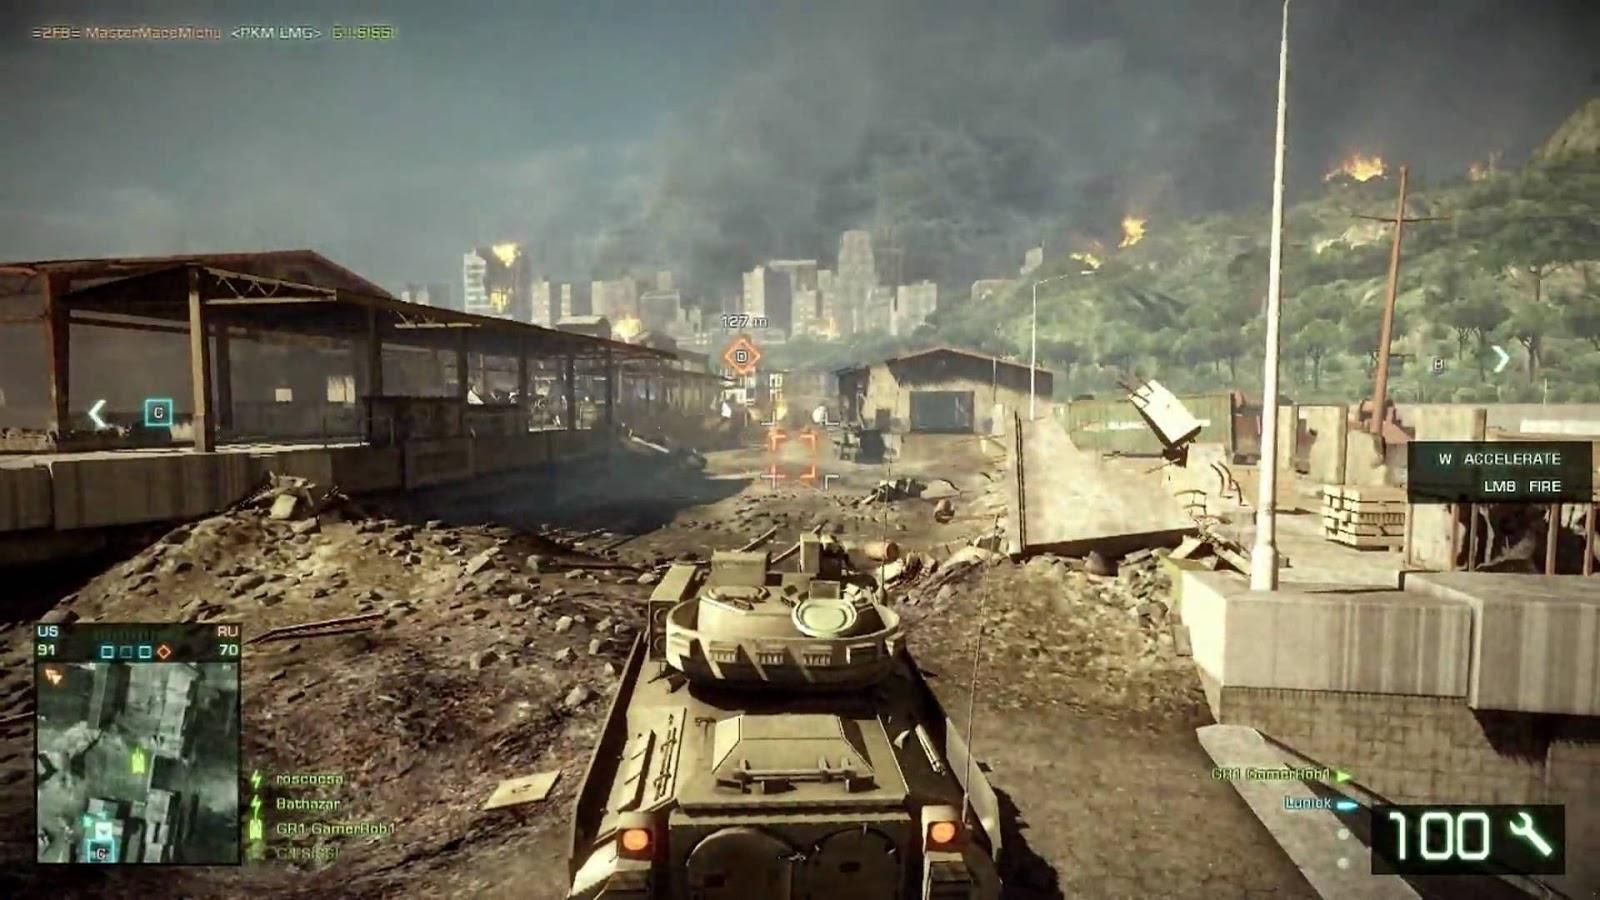 WD - Battlefield Bad Company 2 PC